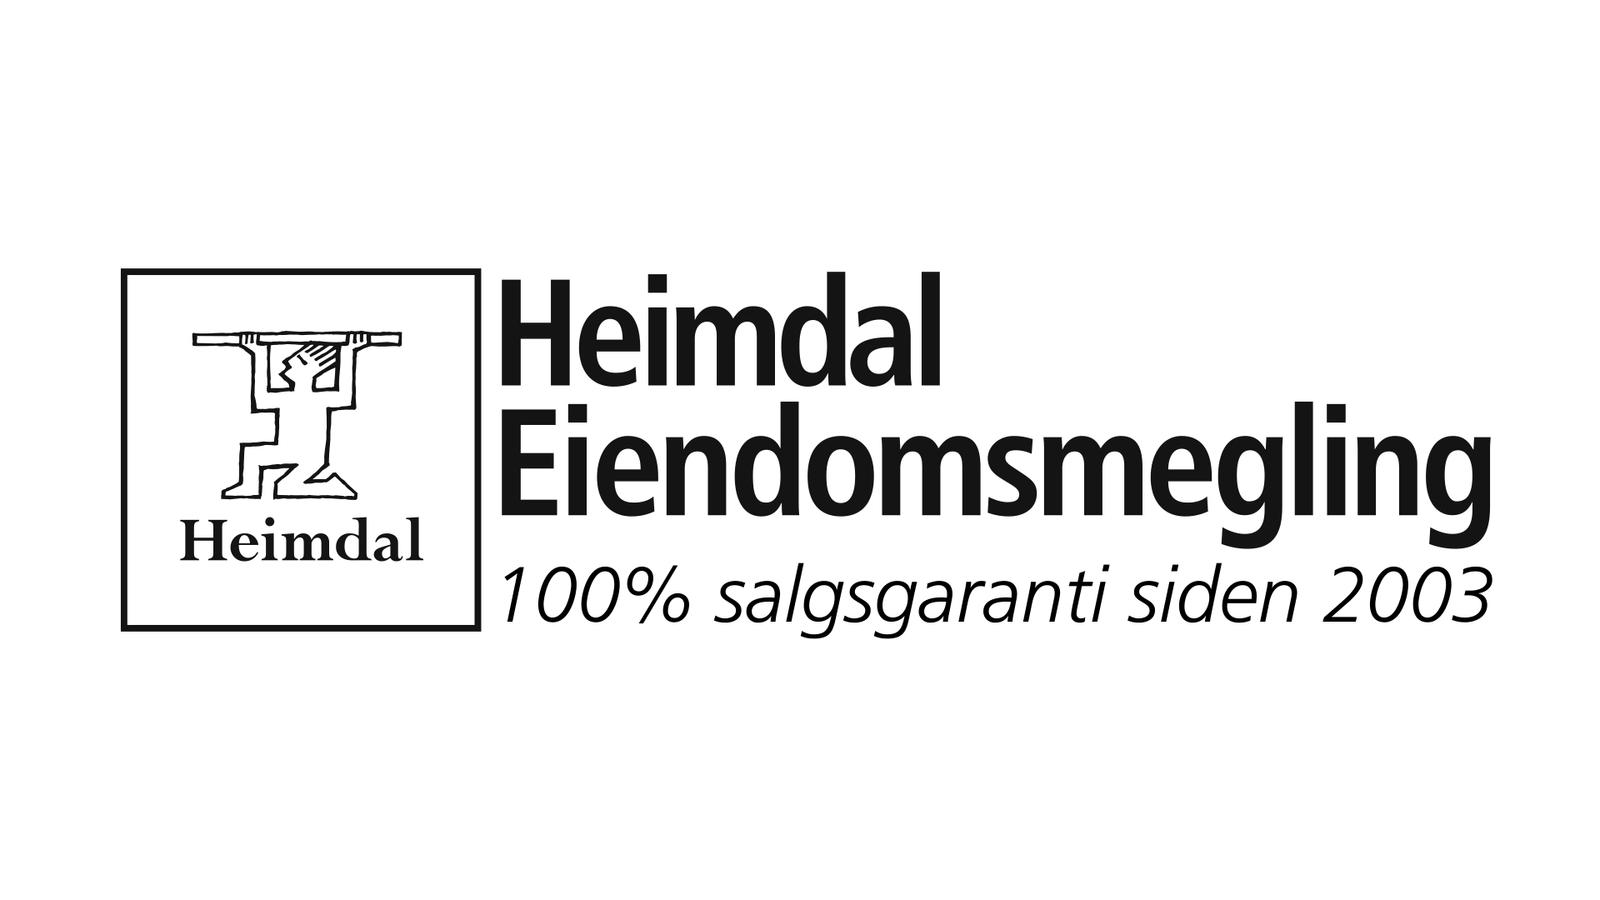 Heimdal Eiendomsmegling AS avd Trondheim